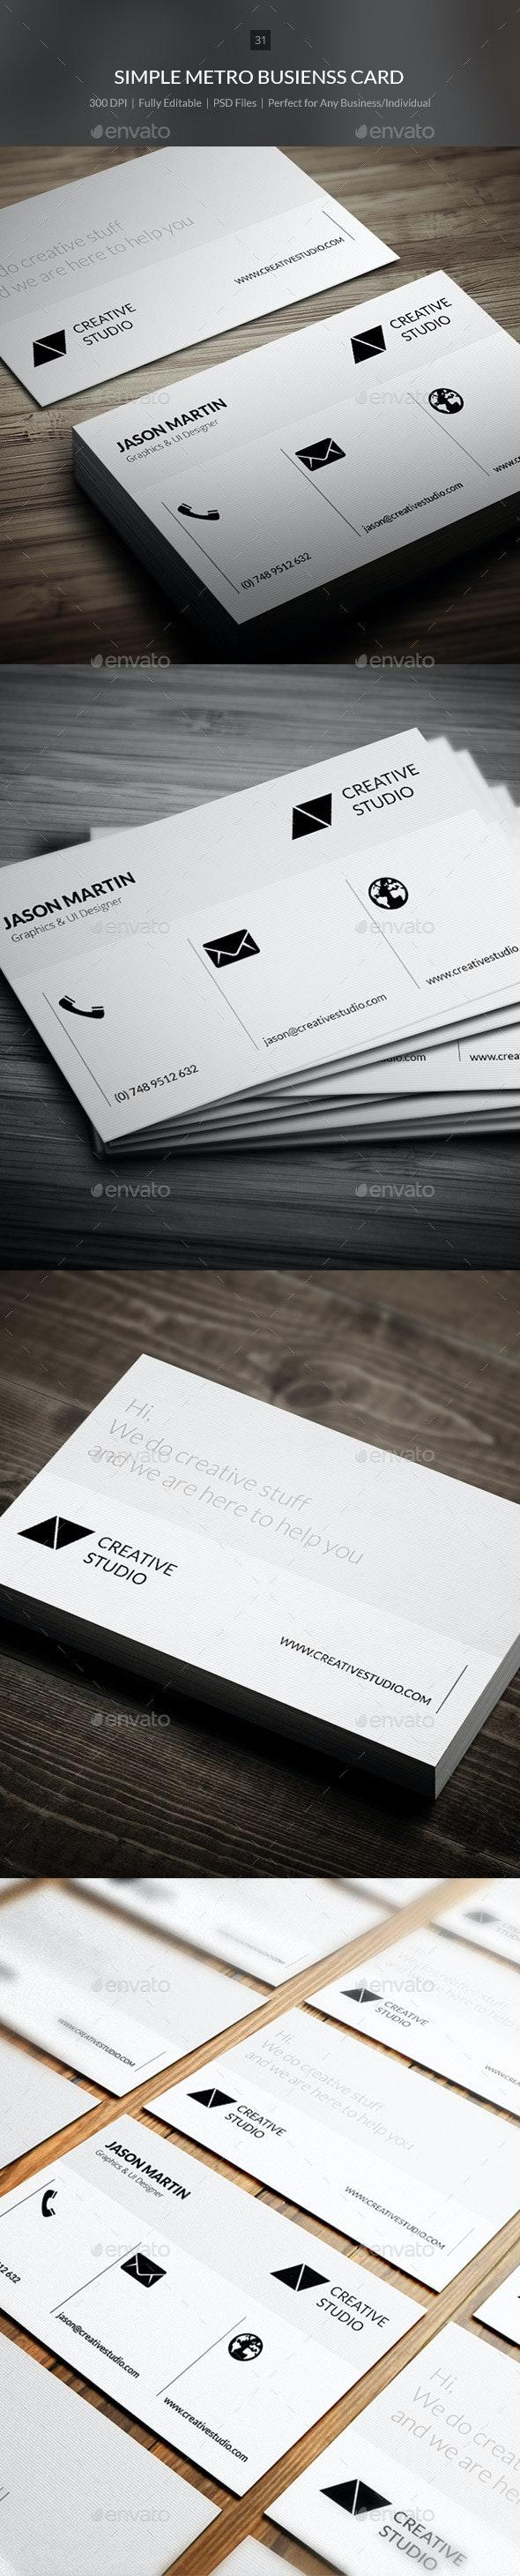 Simple Metro Business Card - 31 - Corporate Business Cards